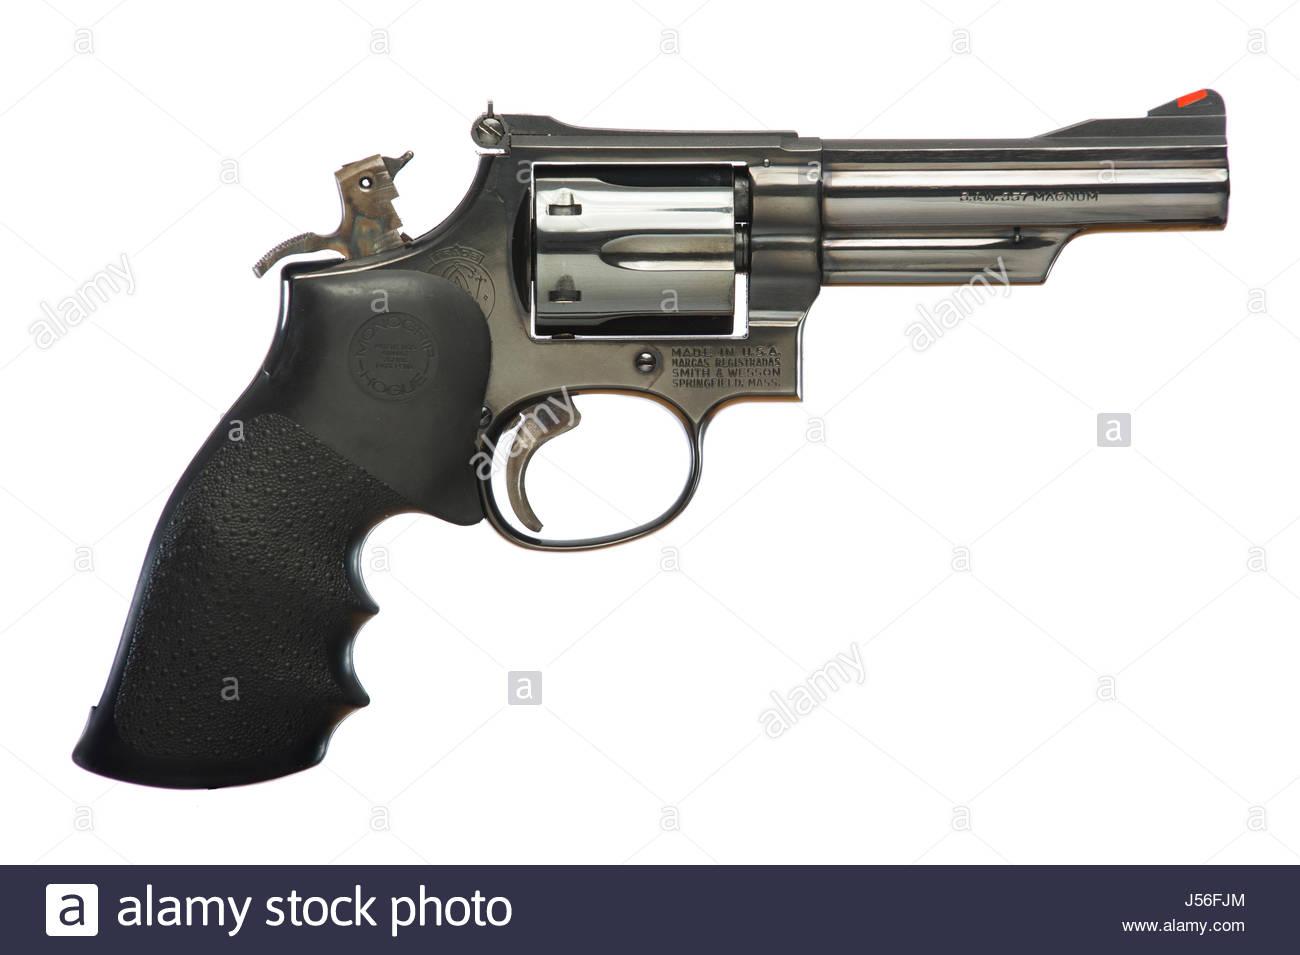 Smith & Wesson modelo Magnum calibre 57, 0,357, N marco, 4 pulgadas ...